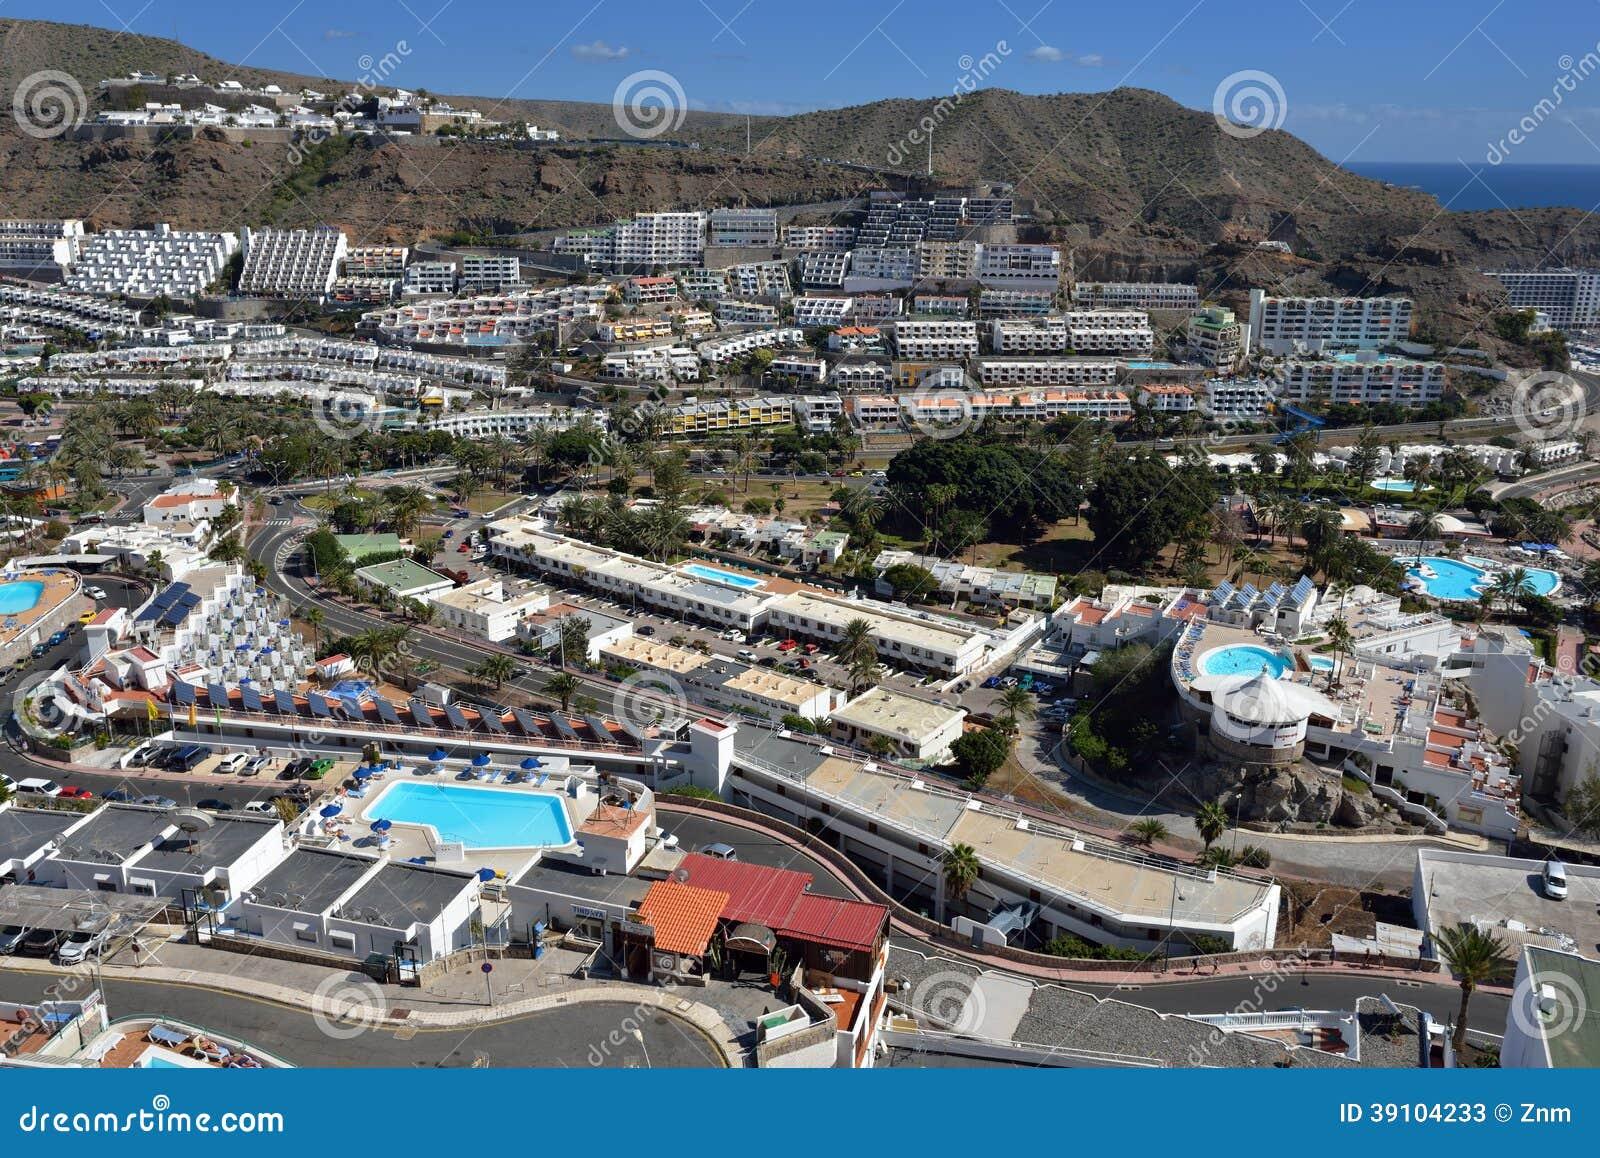 Puerto Rico Canary Islands Restaurants